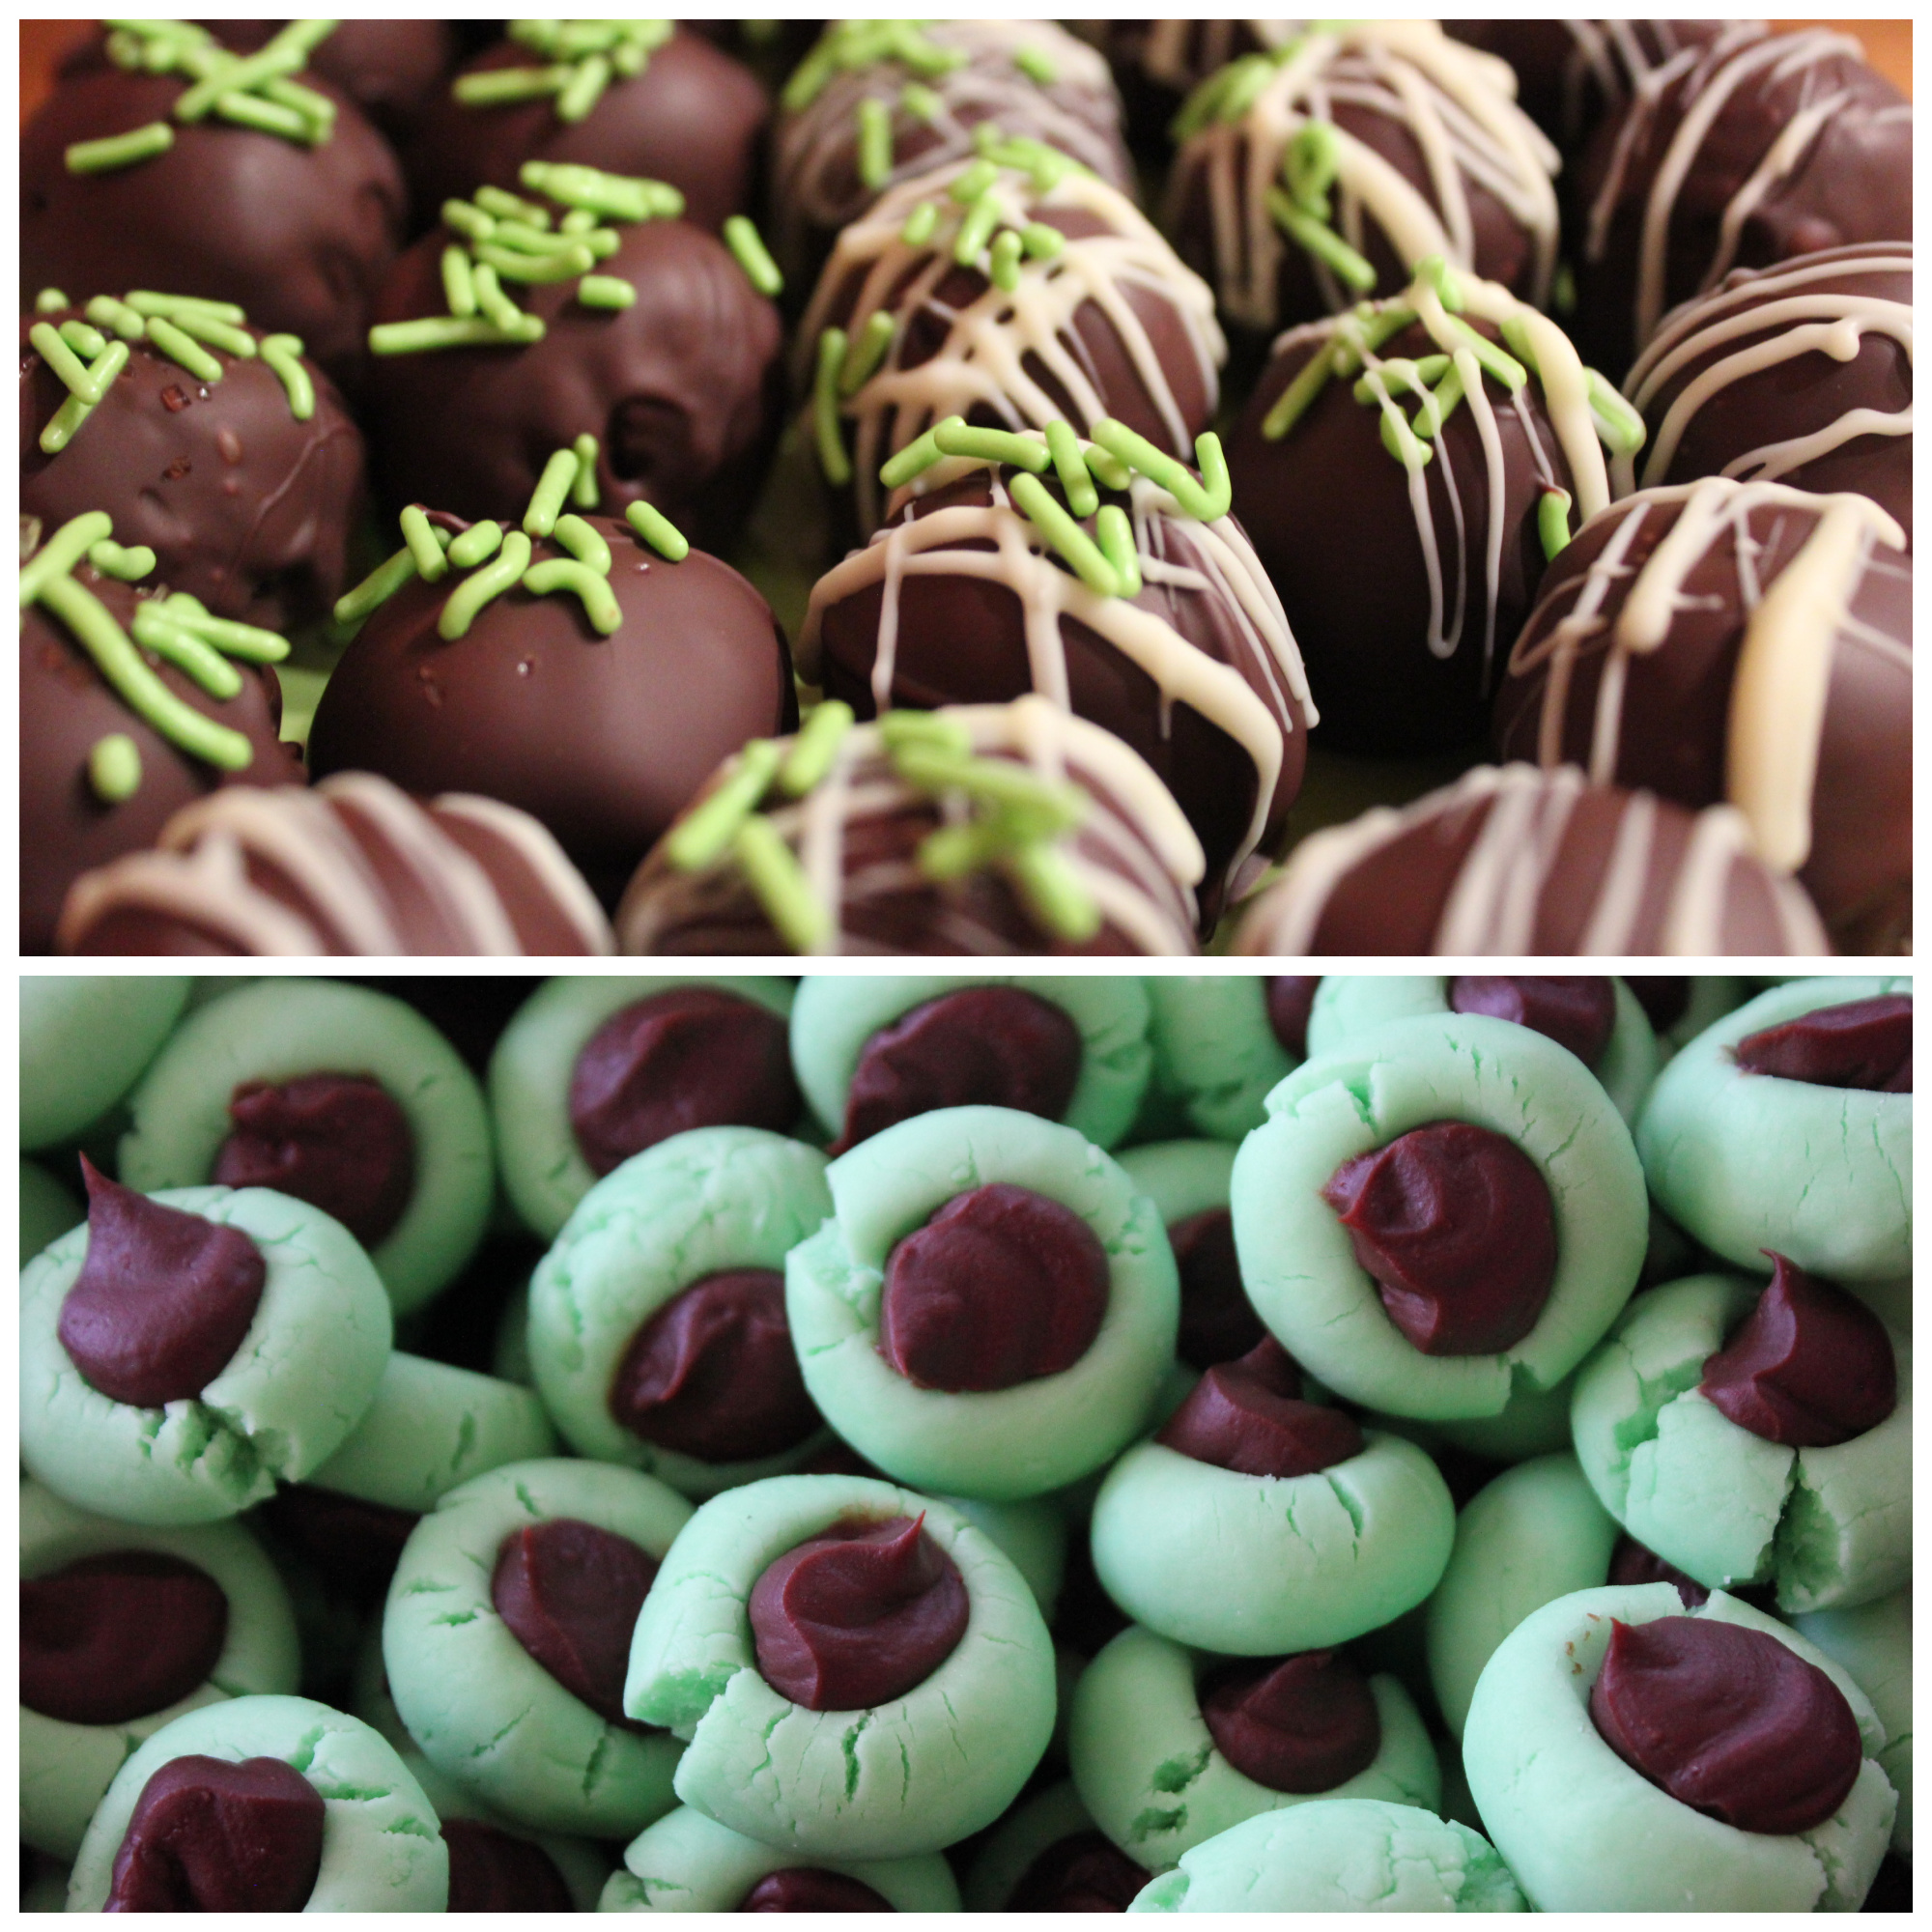 Top photo: Mint Oreo balls; bottom photo: Chocolate Mint Cream Cheese Buttons